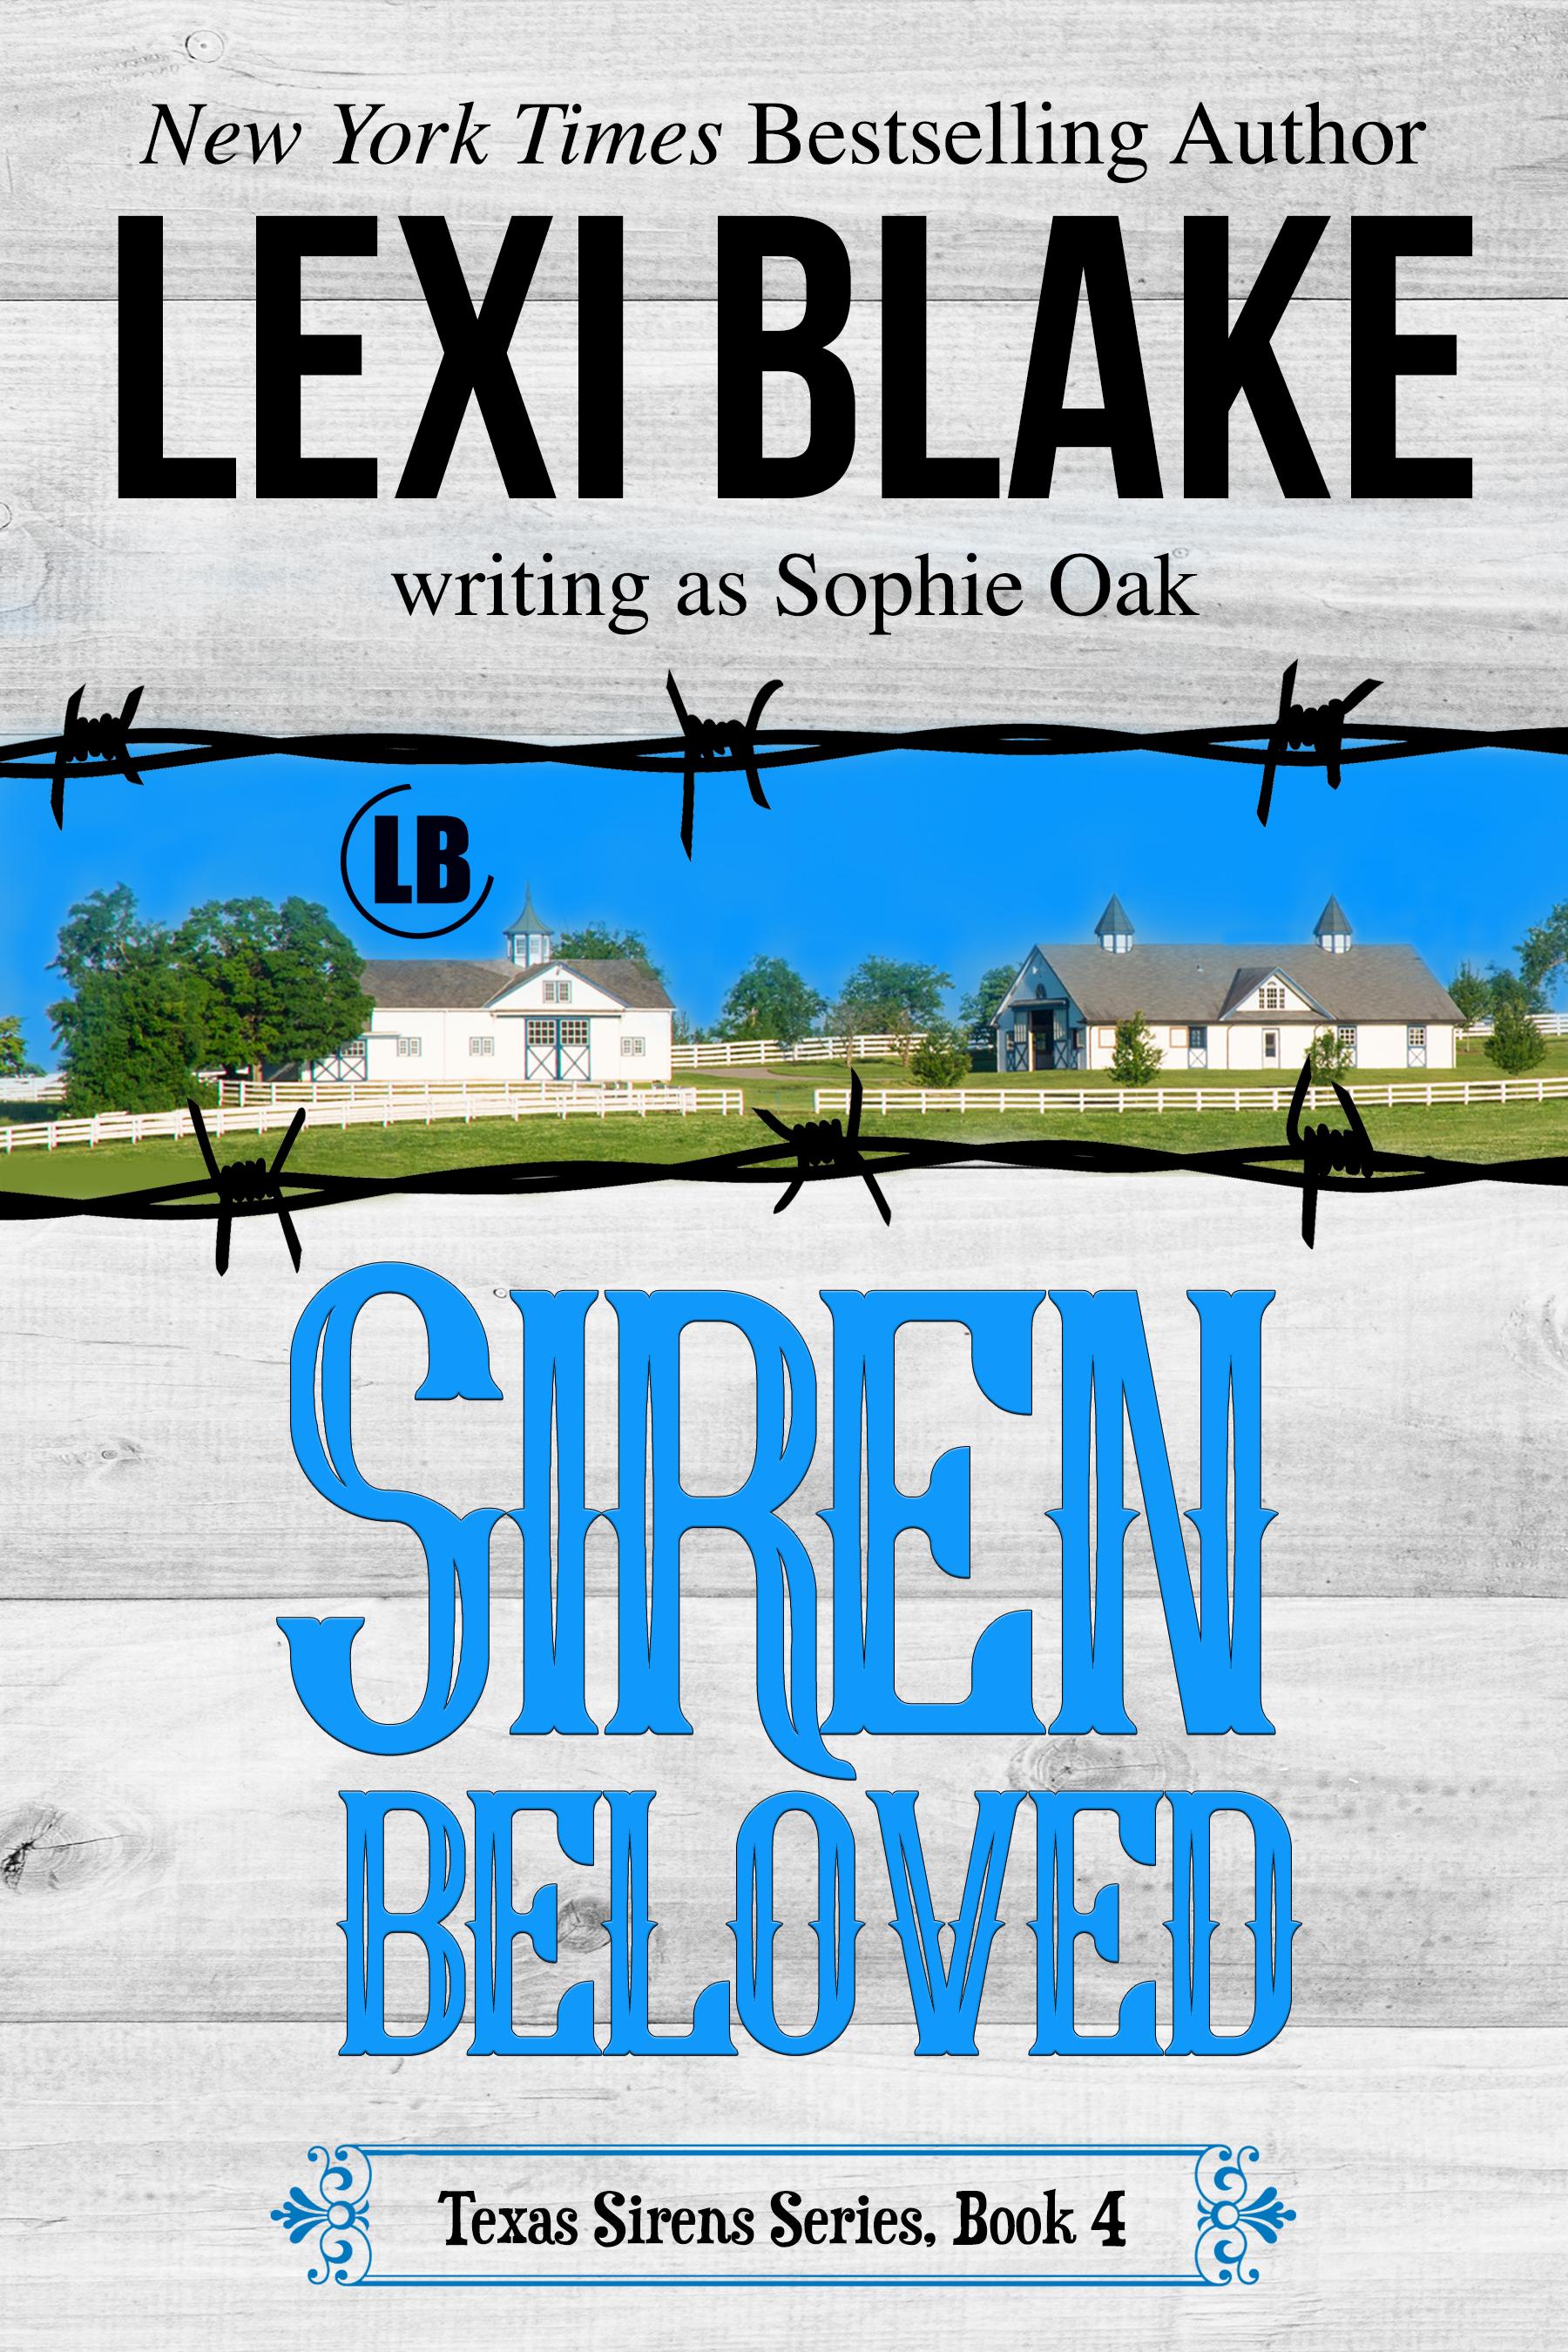 Siren Beloved eBook New highres.jpg